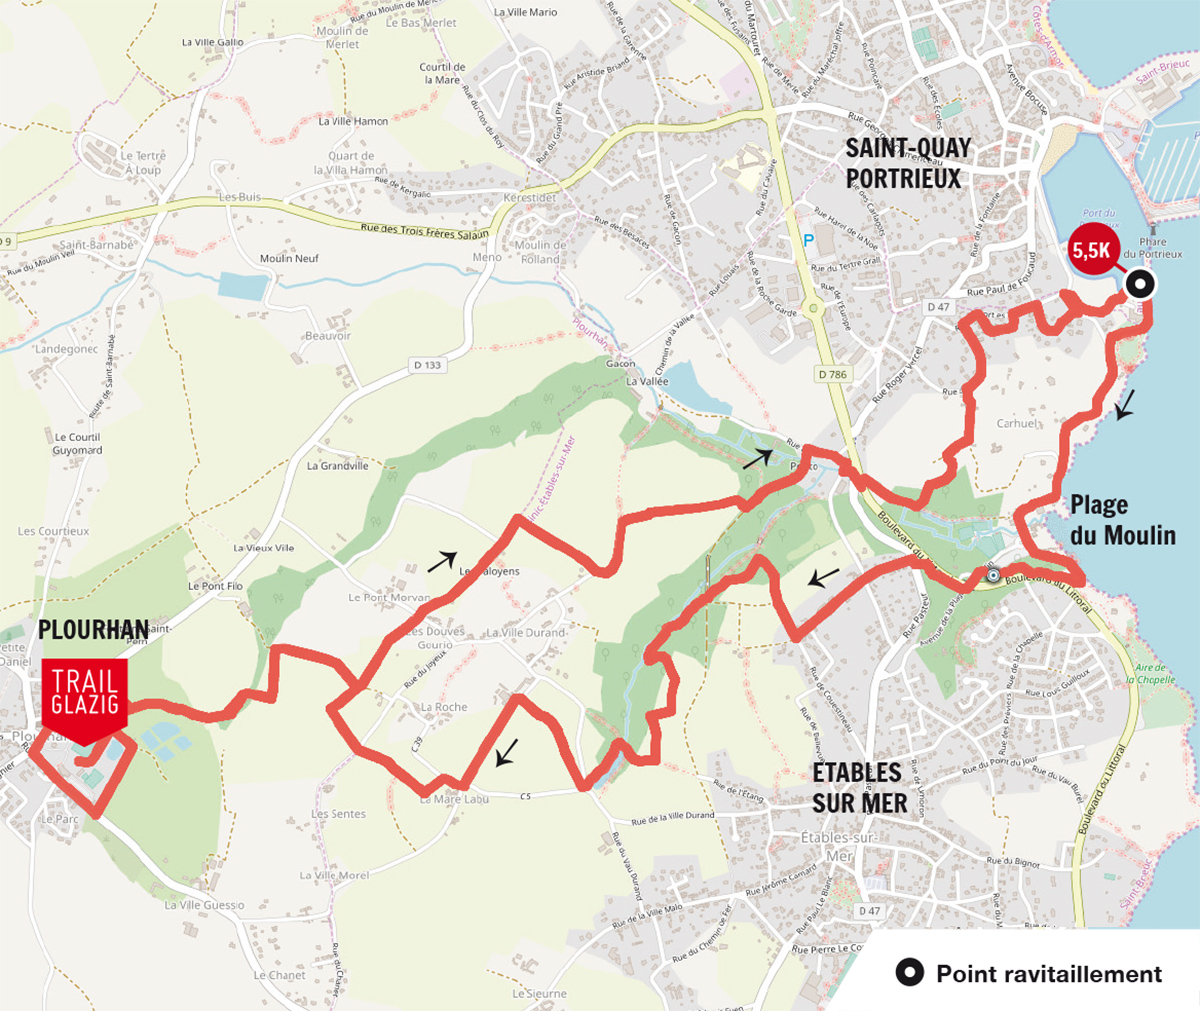 Ravito 12K Trail Glazig 2020